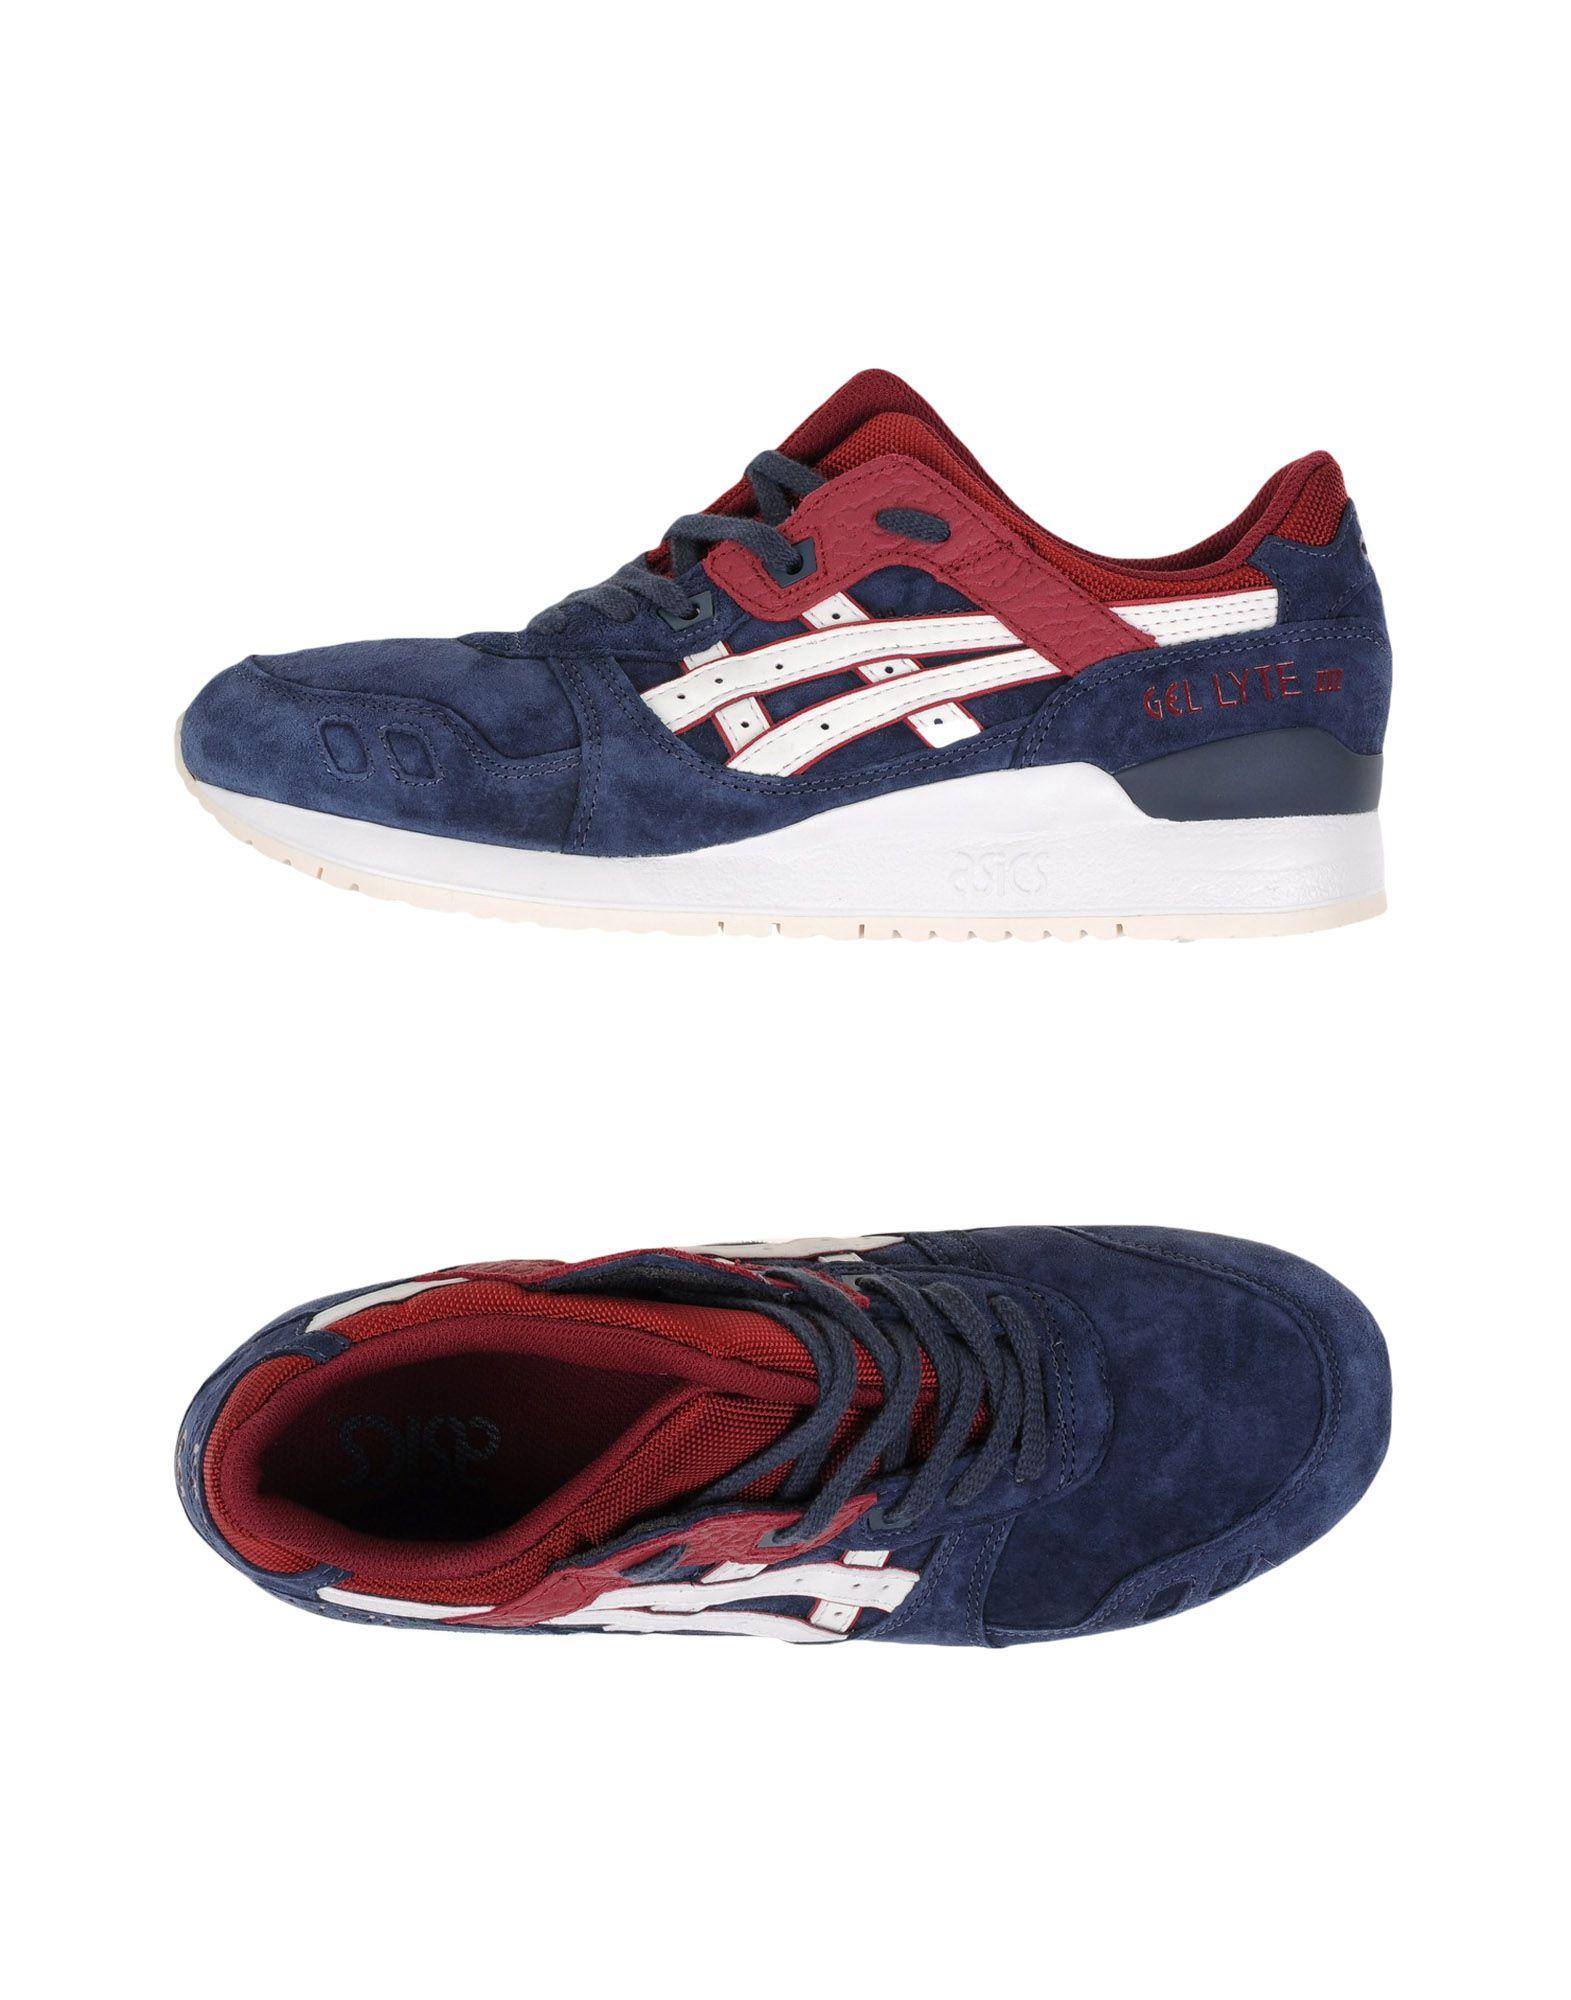 Sneakers Asics Tiger Gel-Lyte Iii - Homme - Sneakers Asics Tiger sur